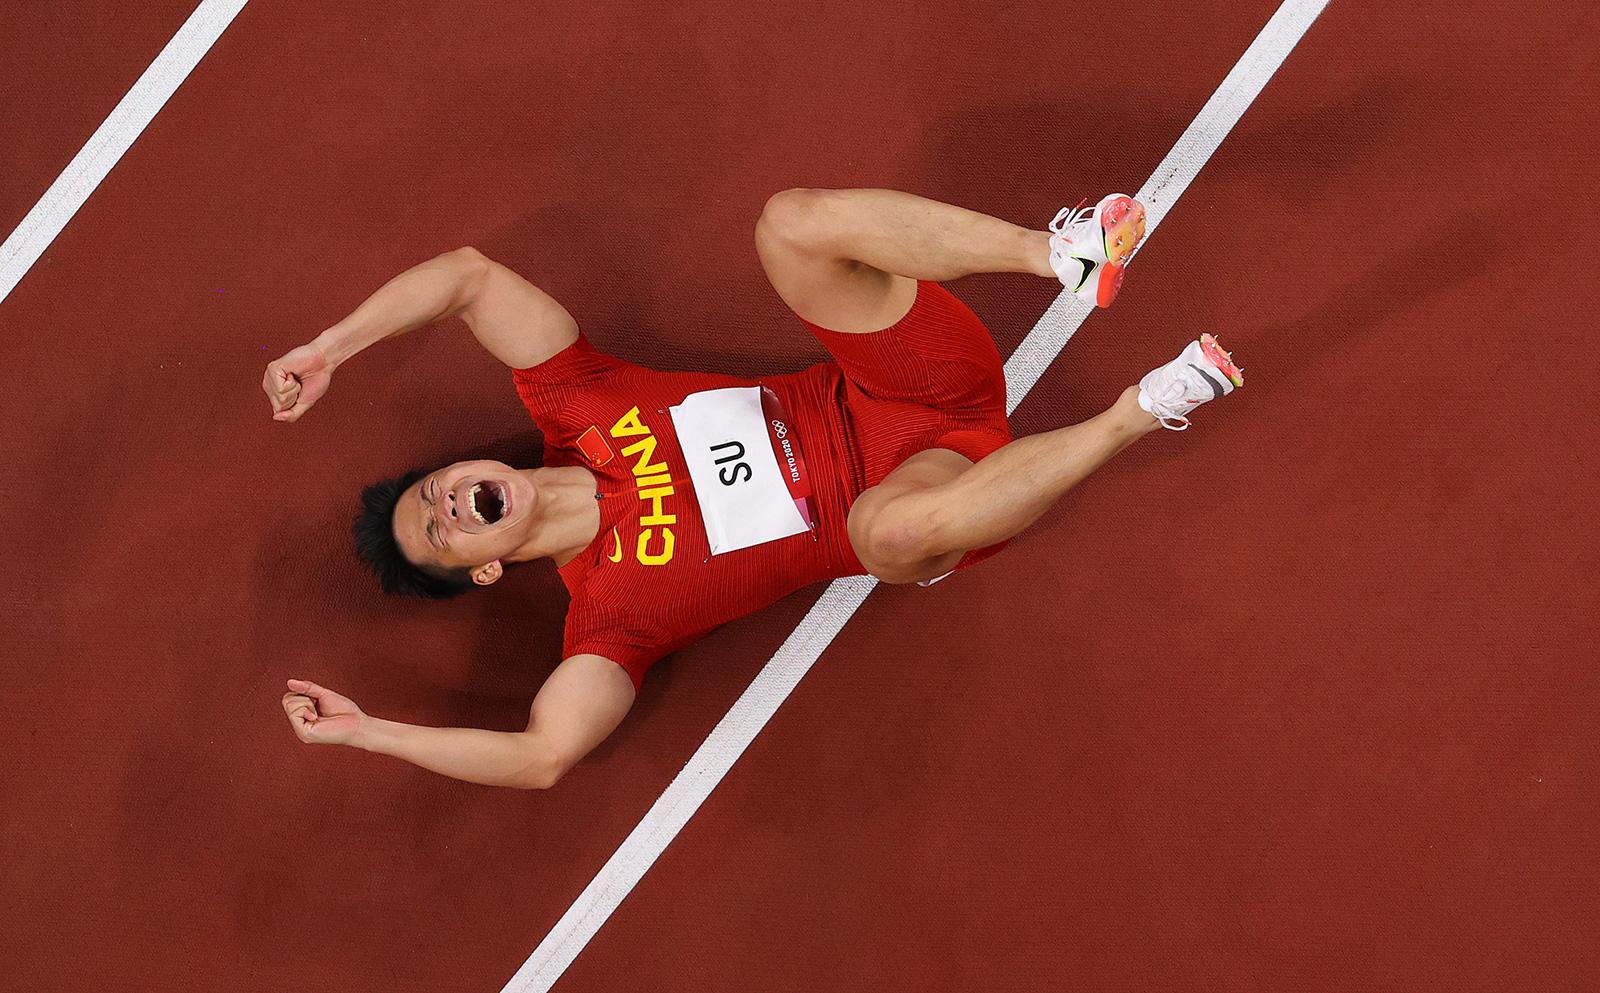 China's Su Bingtian celebrates after winning his 100 meter semifinal on Sunday.